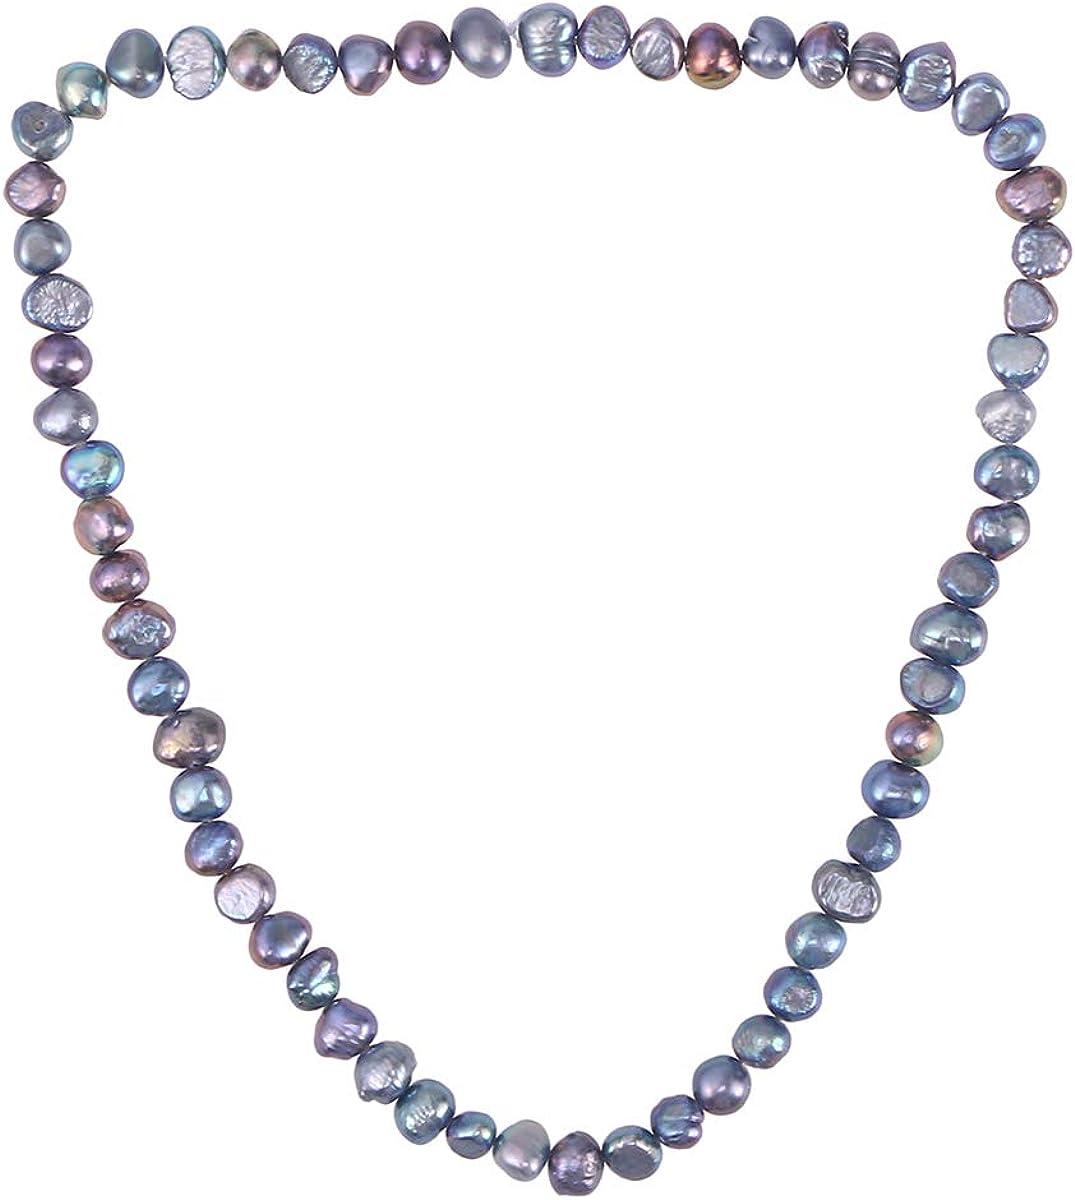 FENICAL Collar de Perlas Naturales cultivadas de Agua Dulce barroca Moda Collar de Perlas de par Irregular (Gris)